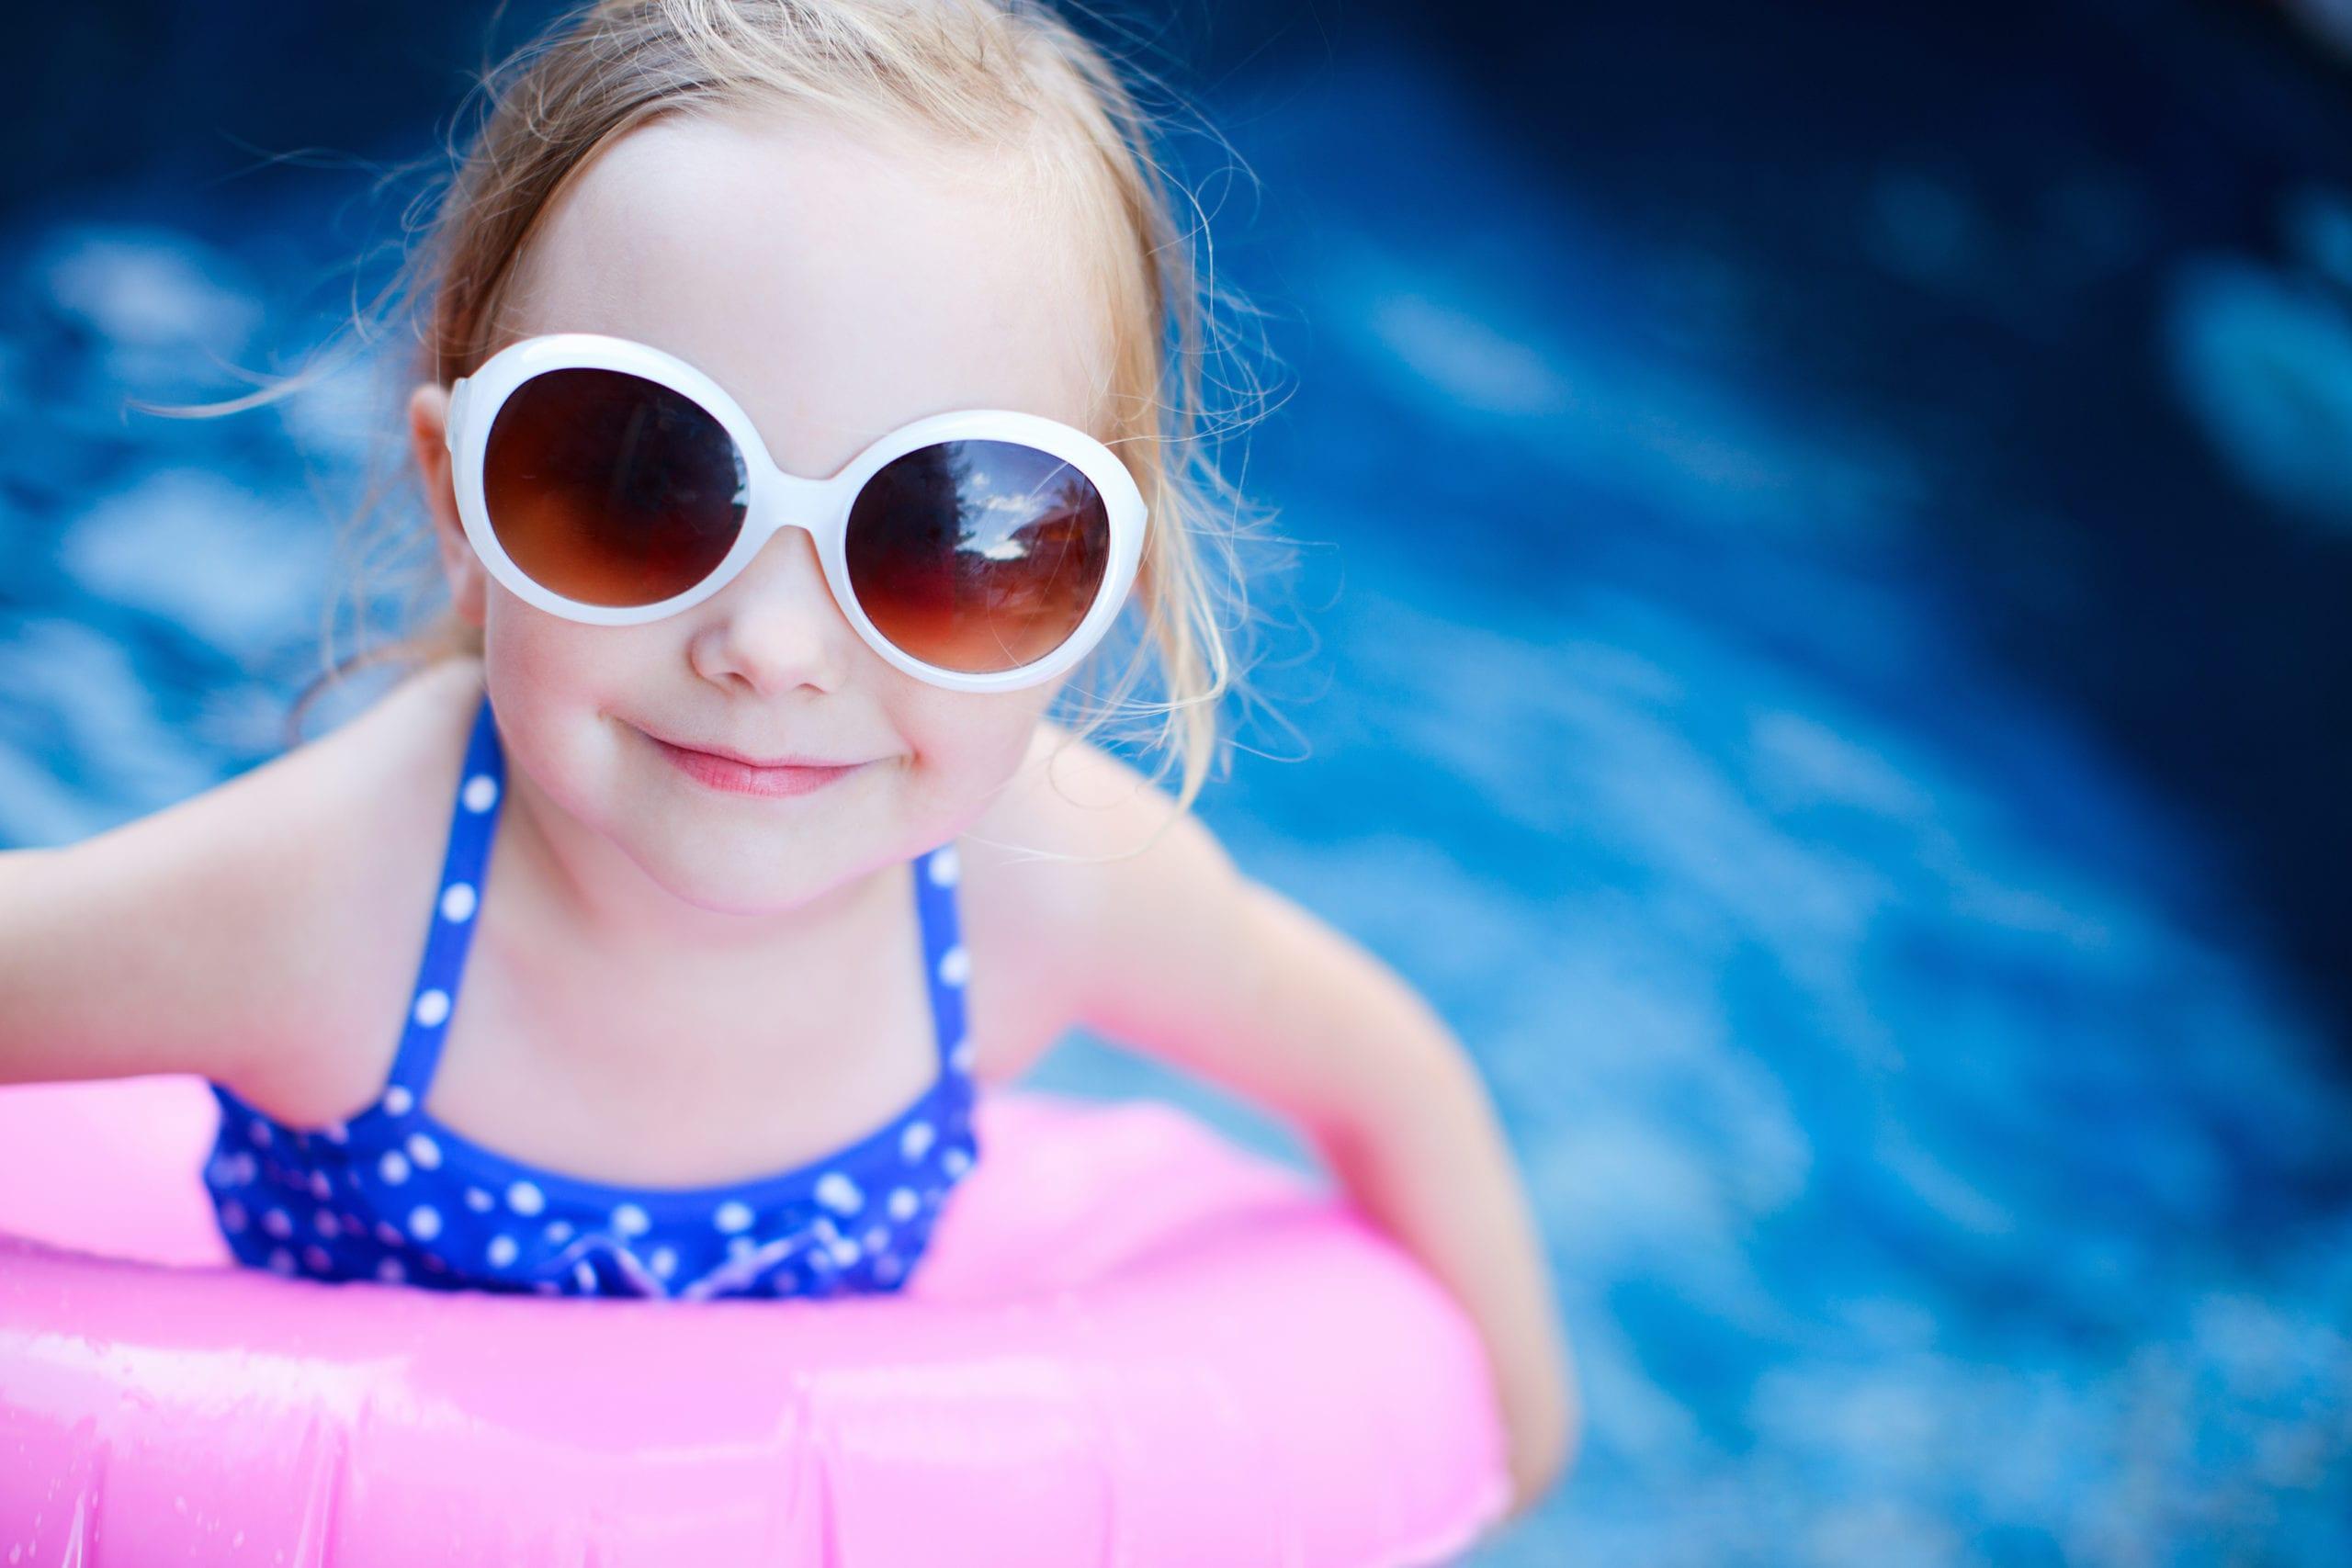 little girl wearing sunglasses in a pool